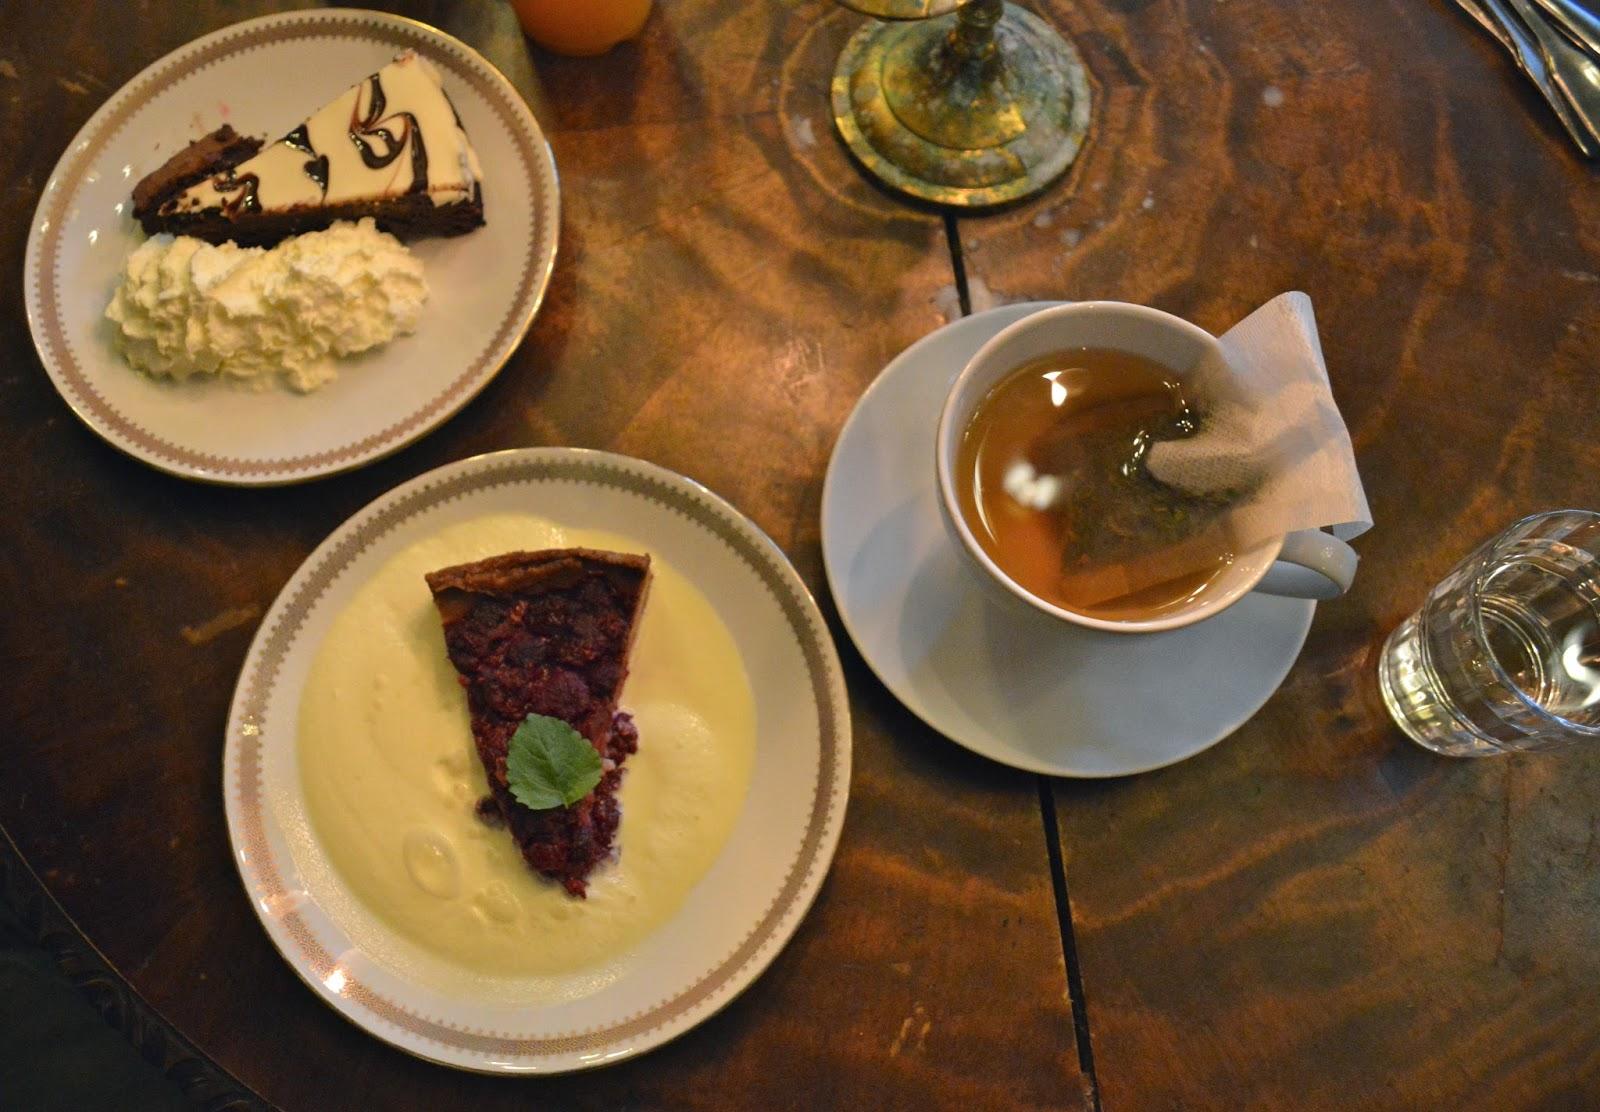 Afternoon tea and cake, fika